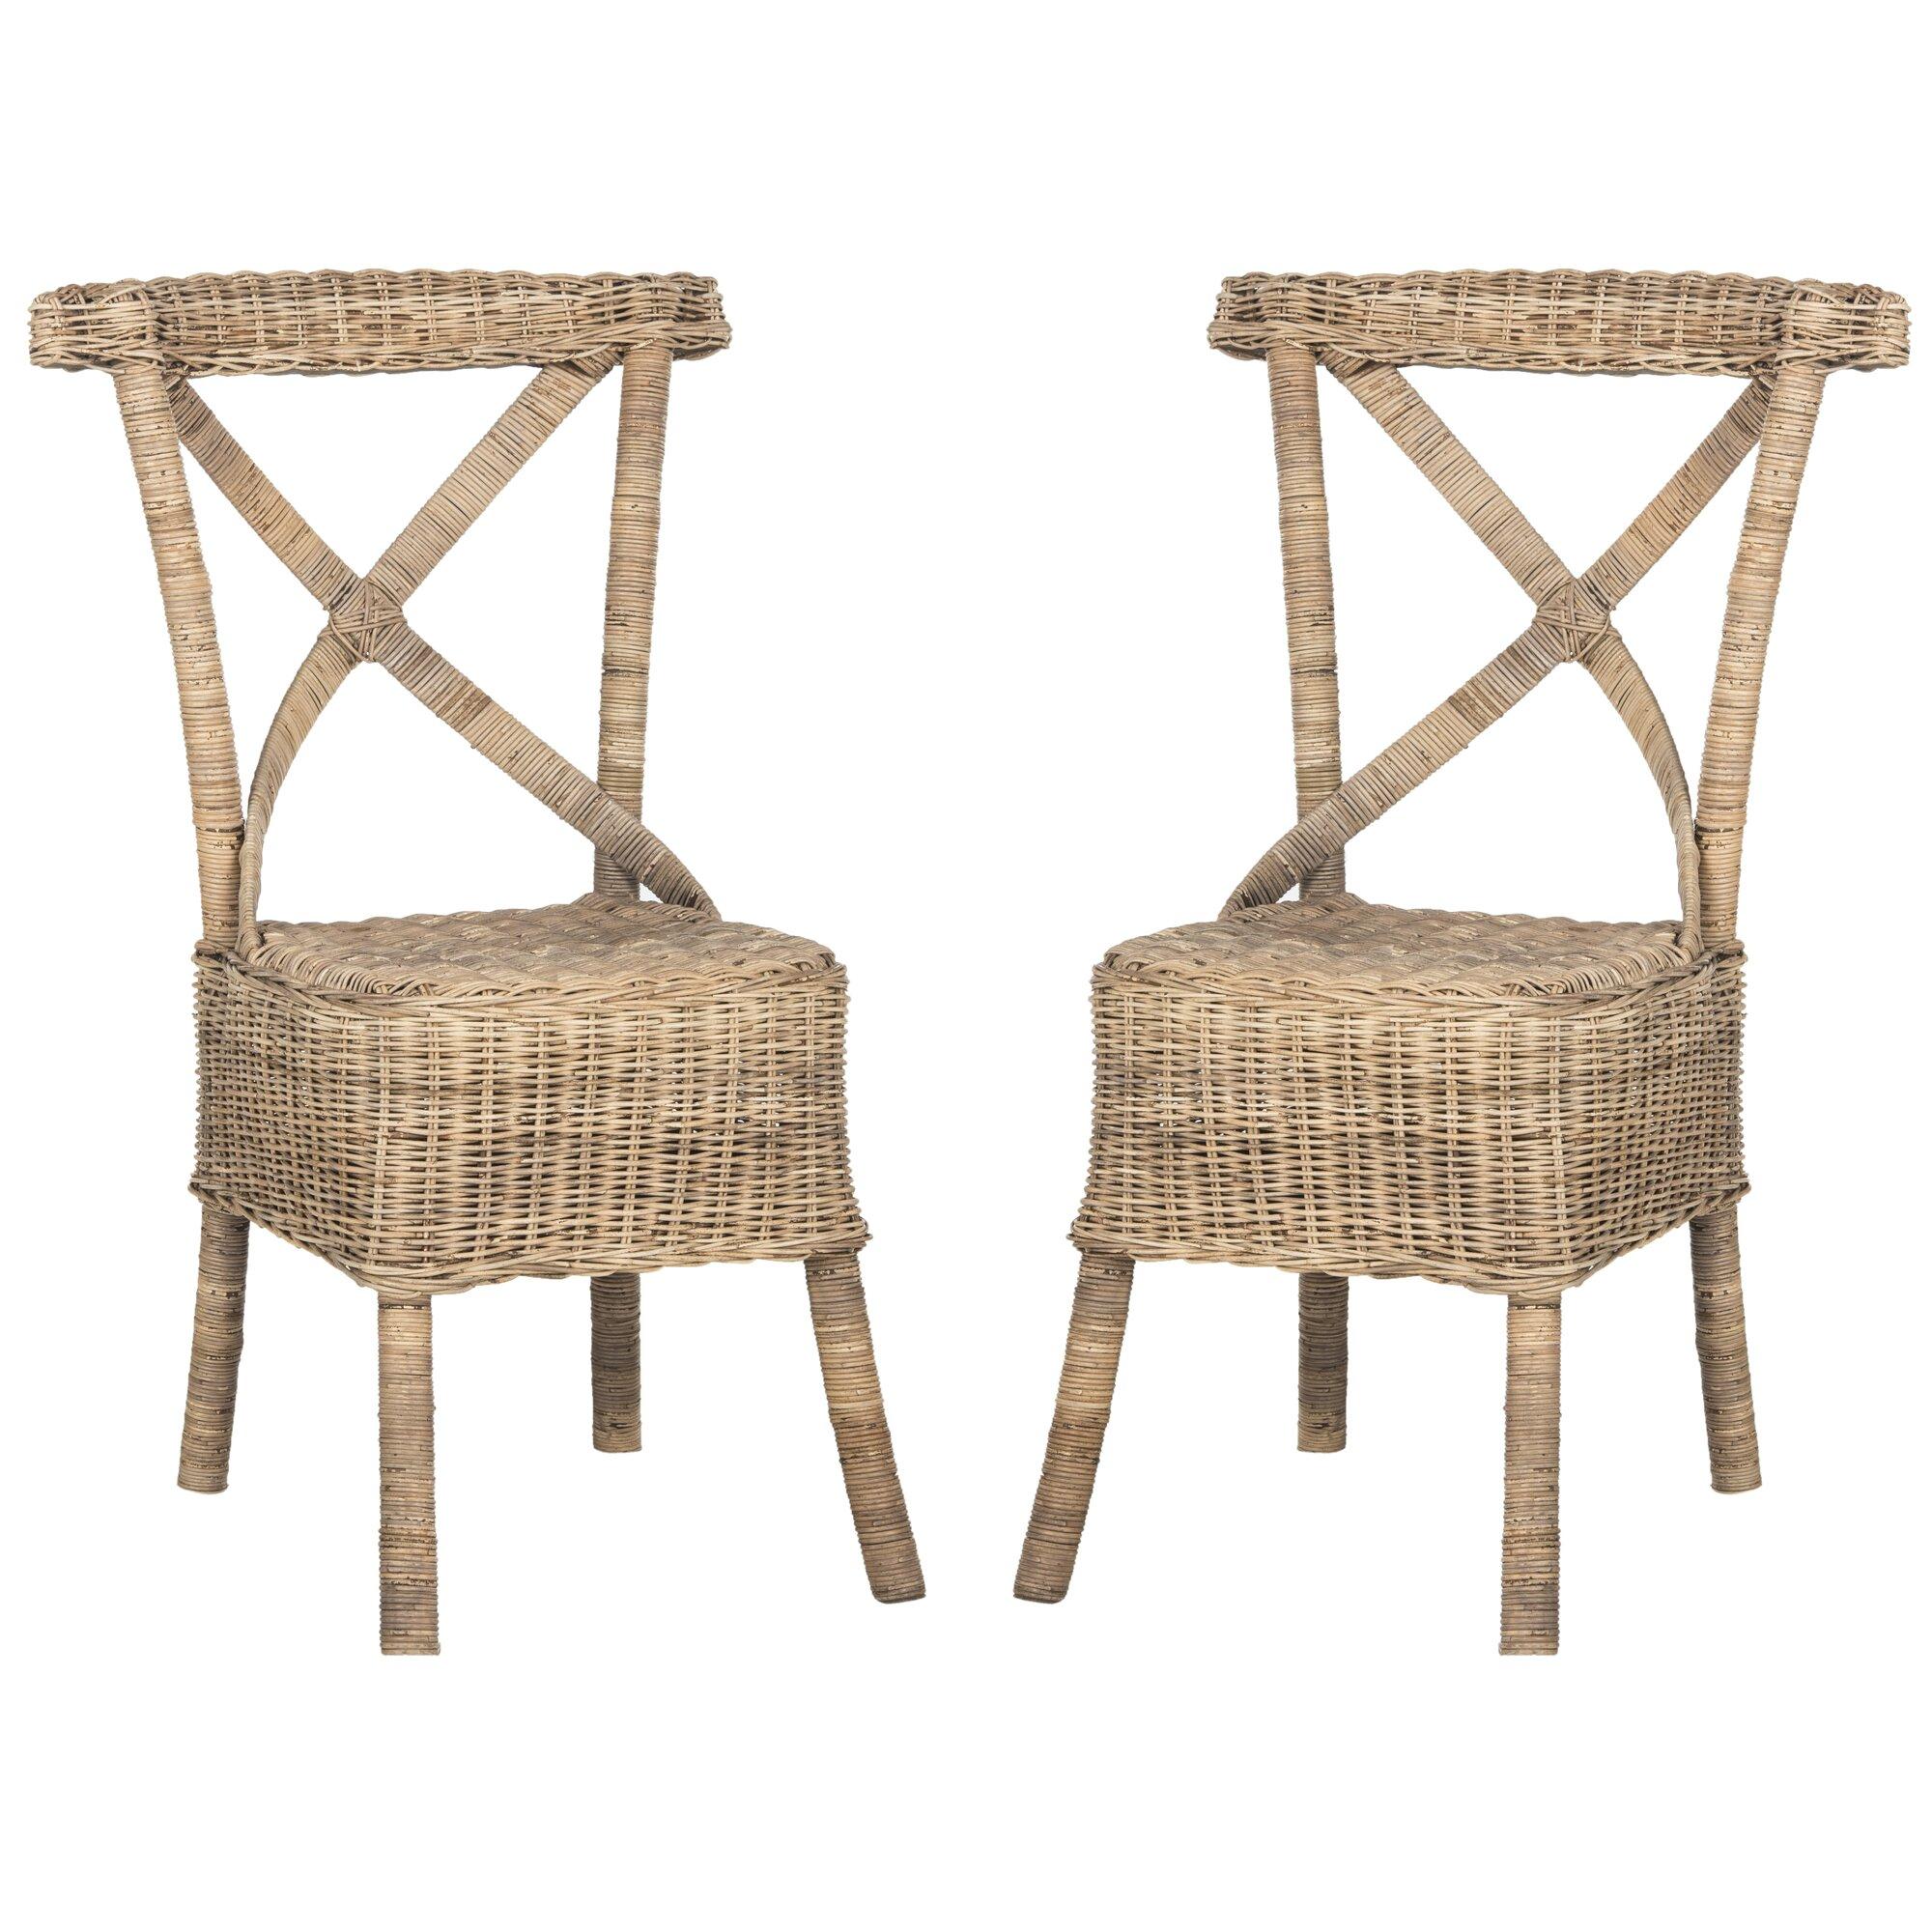 ophelia rattan side chair reviews joss main. Black Bedroom Furniture Sets. Home Design Ideas